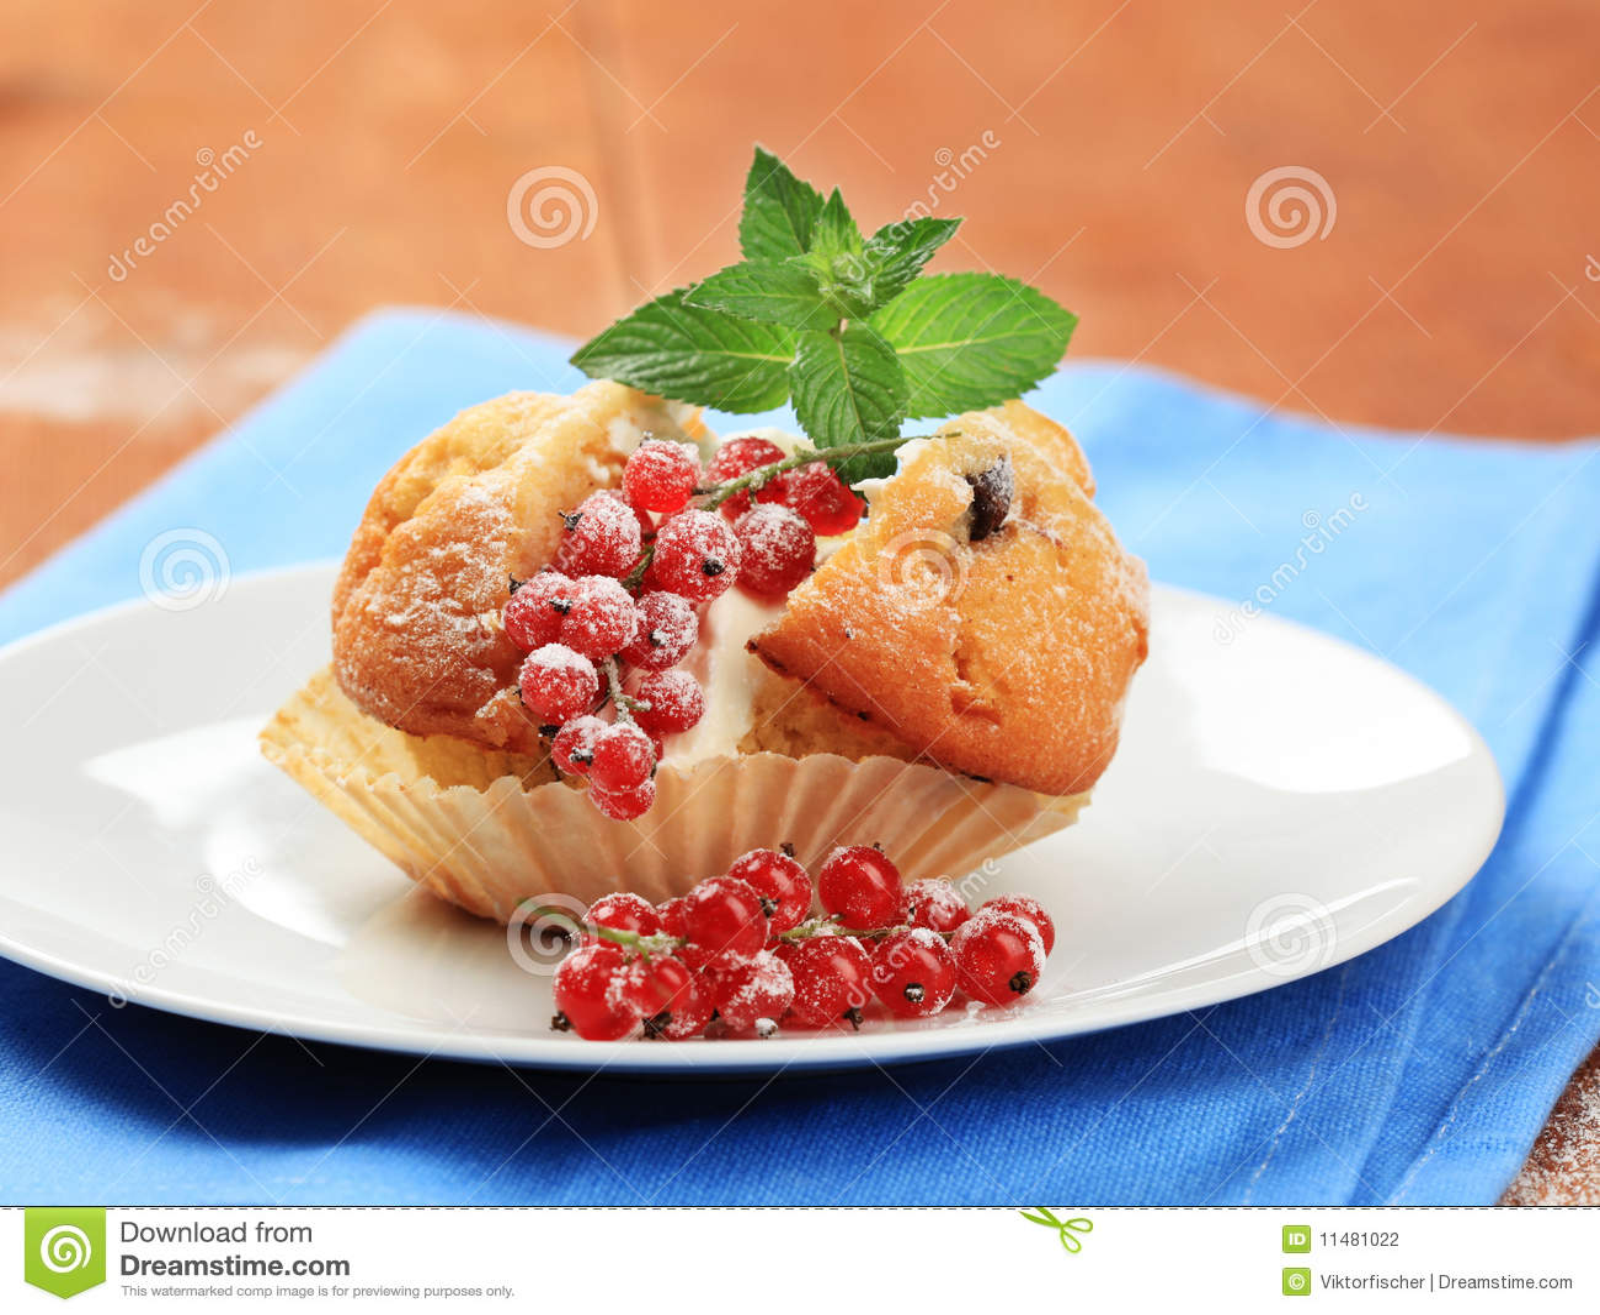 Smakelijke muffin